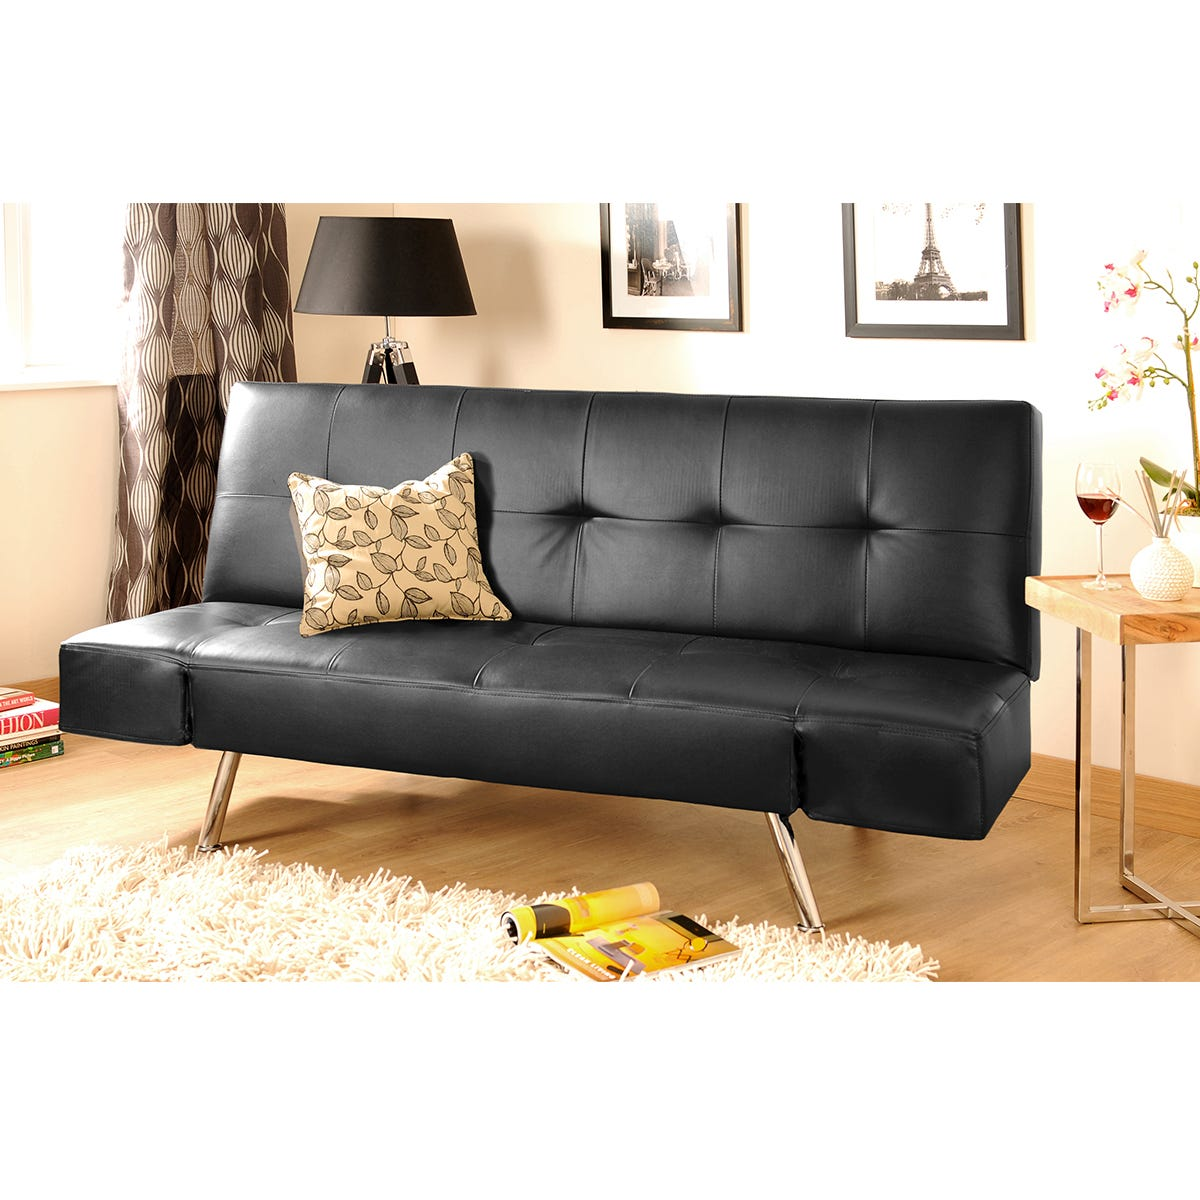 Airlie Sofa Bed - Black